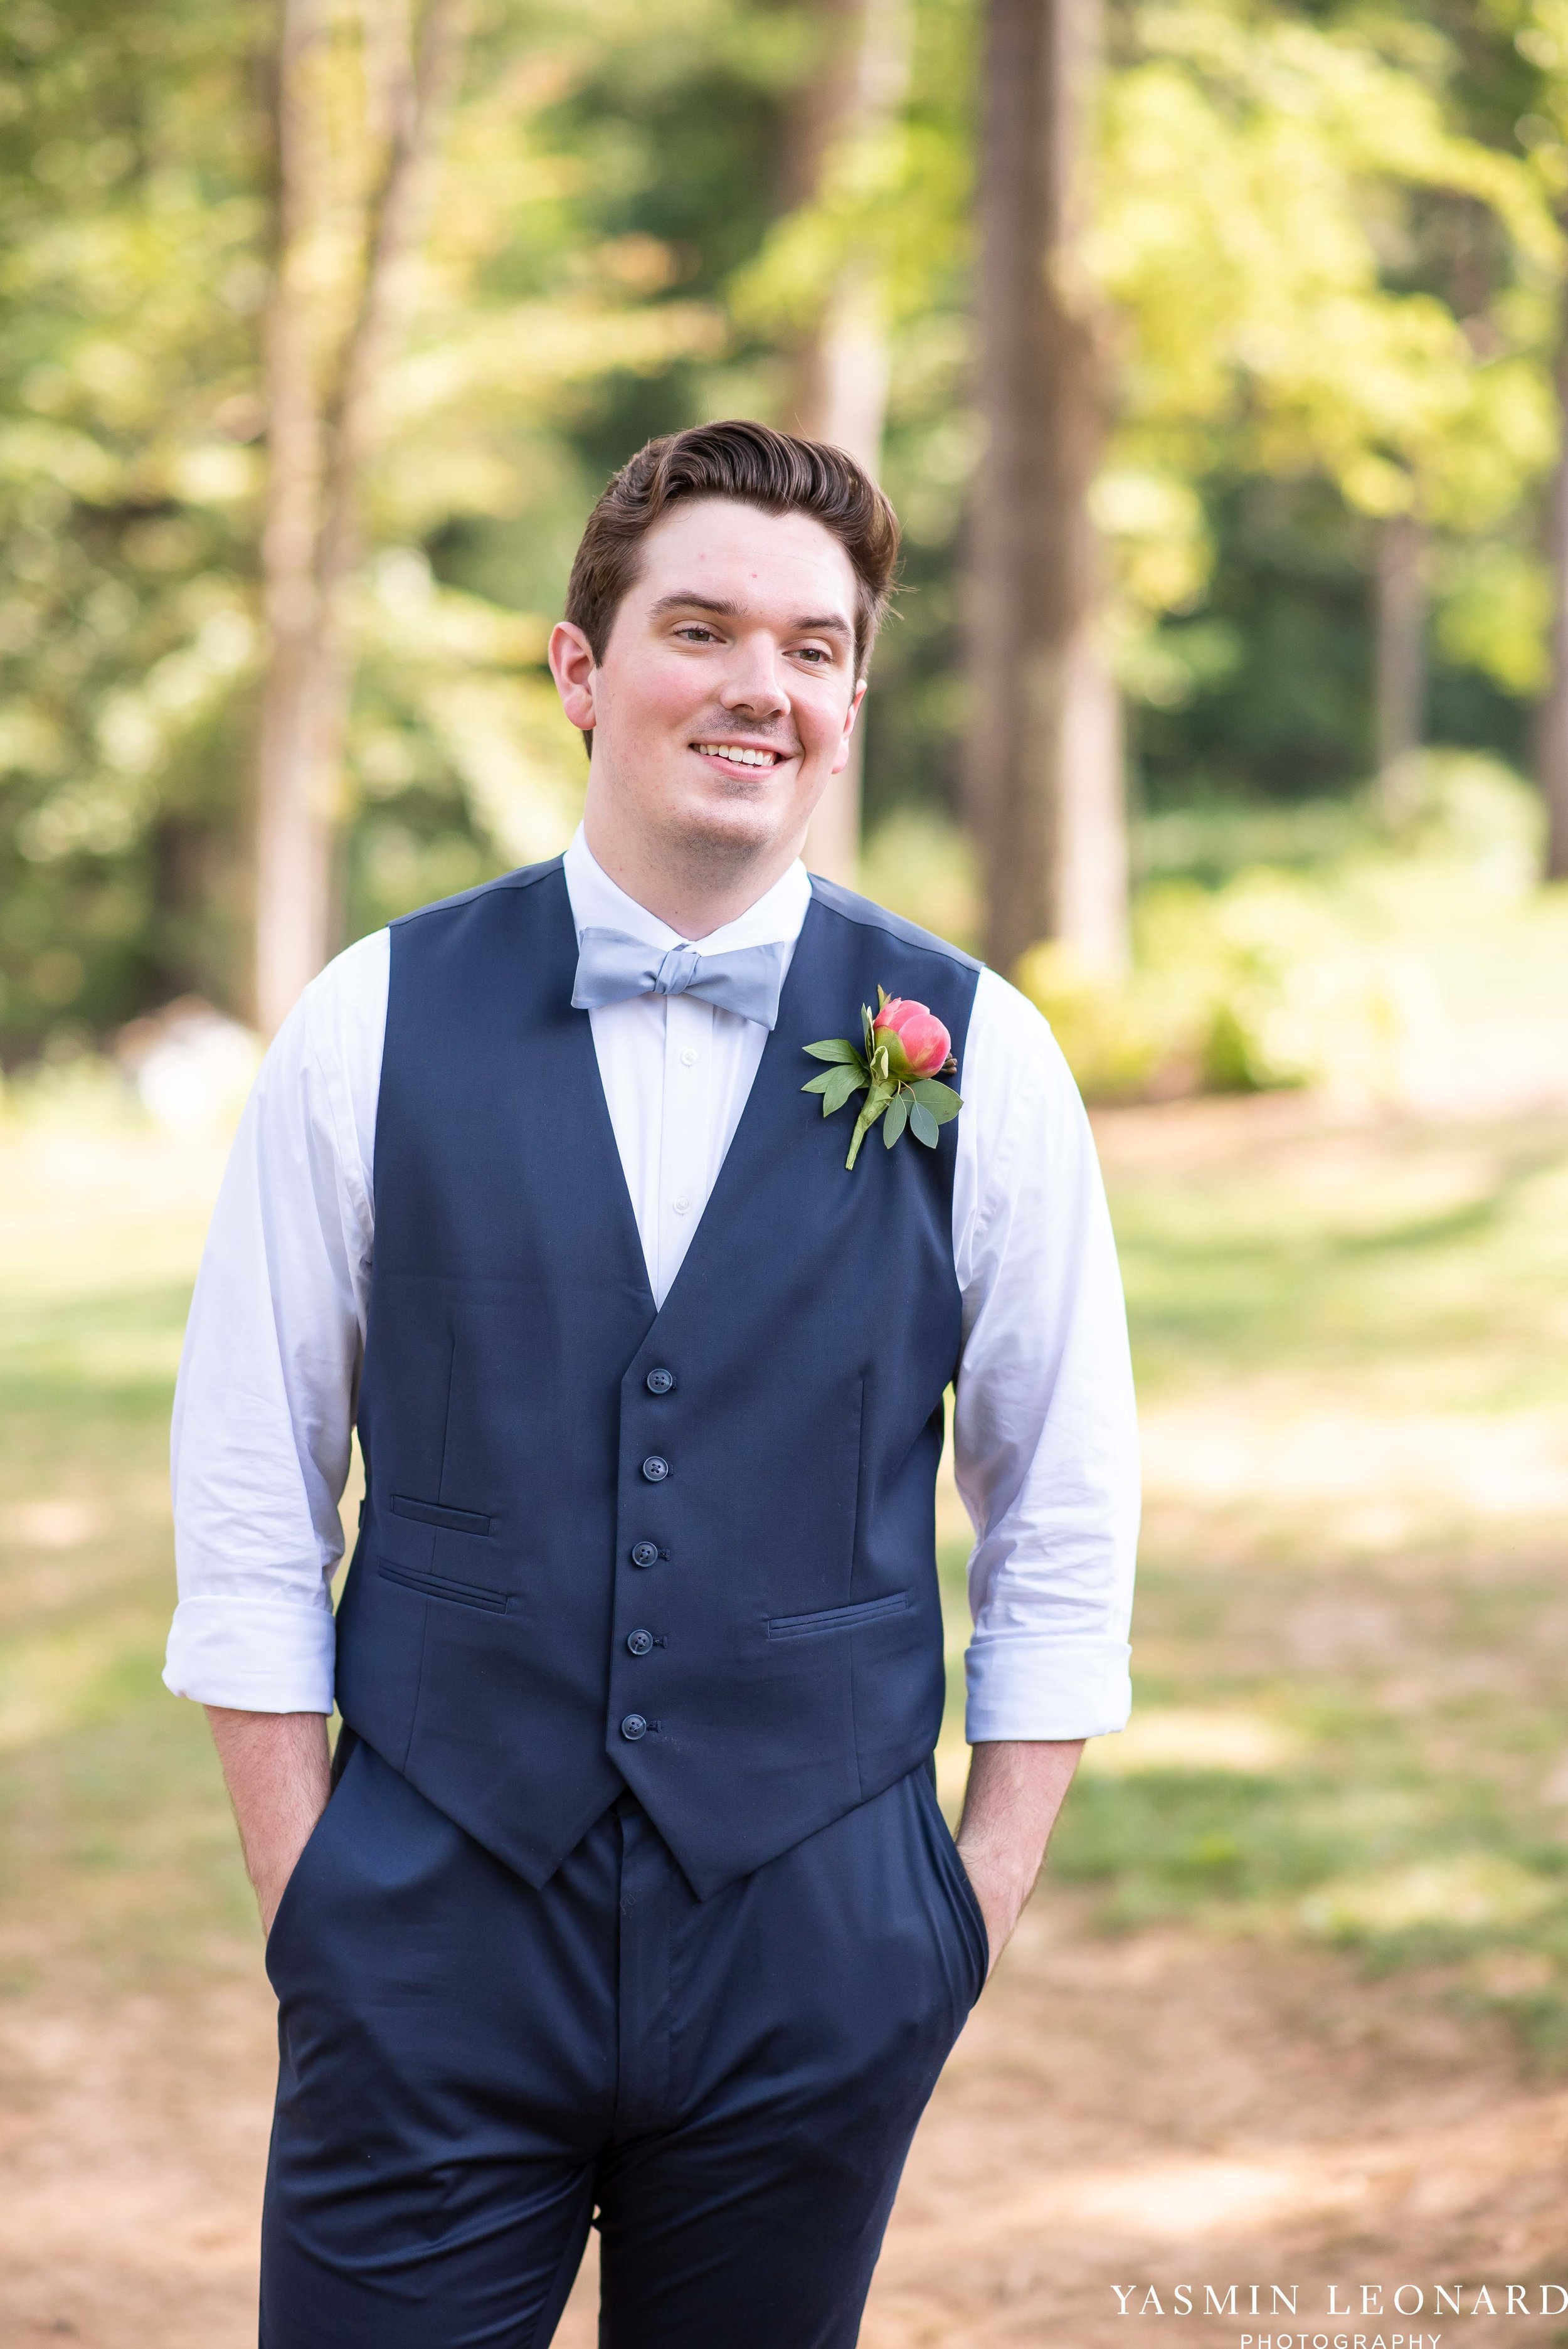 Old Homeplace Vineyard - NC Weddings - Outdoor Summer Weddings - Peony Boutique - Vineyard Wedding - NC Photographer - Yasmin Leonard Photography-15.jpg